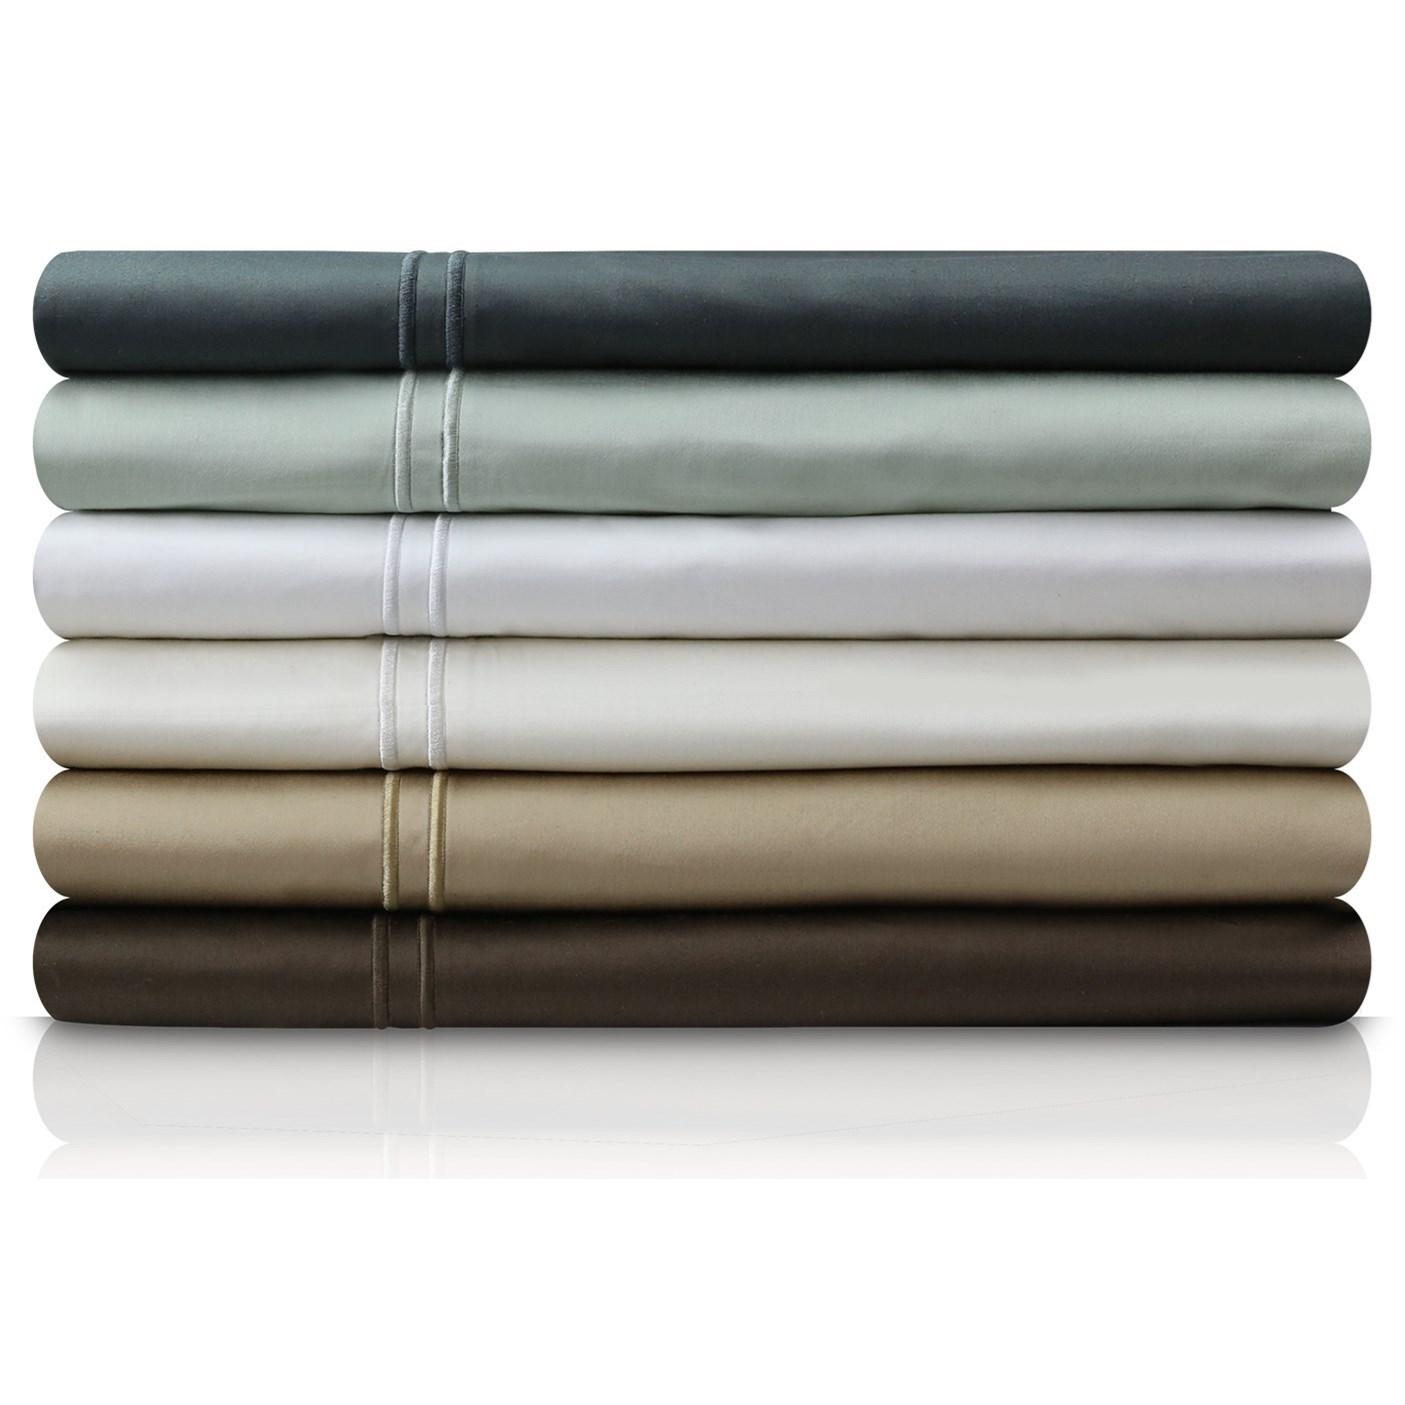 Malouf Egyptian Cotton Full 600 TC Egyptian Cotton Sheet Set - Item Number: MA06FFIVSS